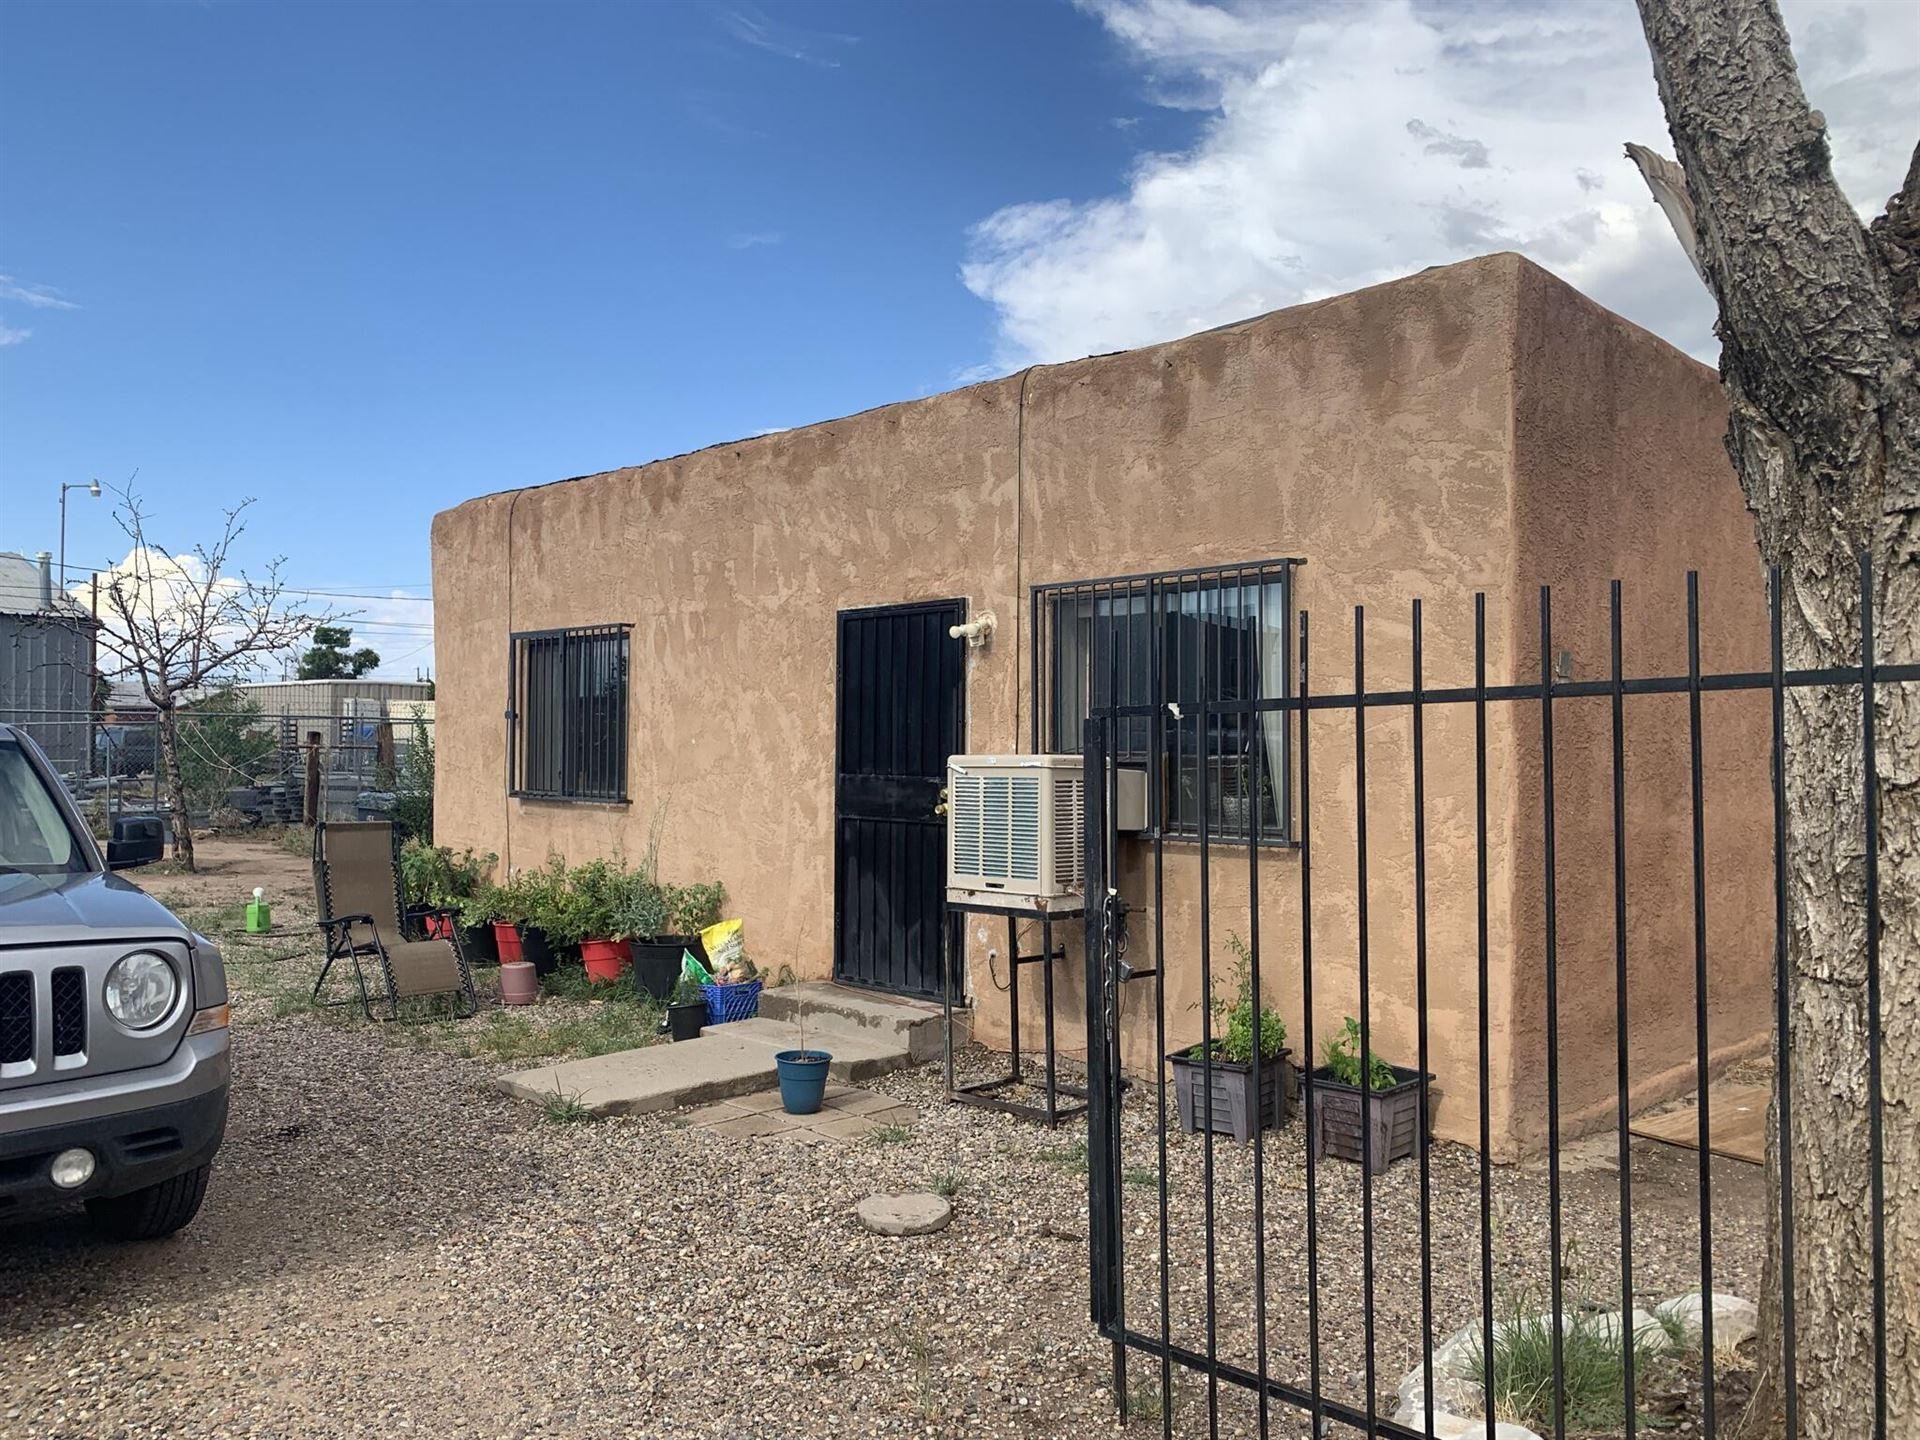 1618 8TH Street NW, Albuquerque, NM 87102 - #: 1001510